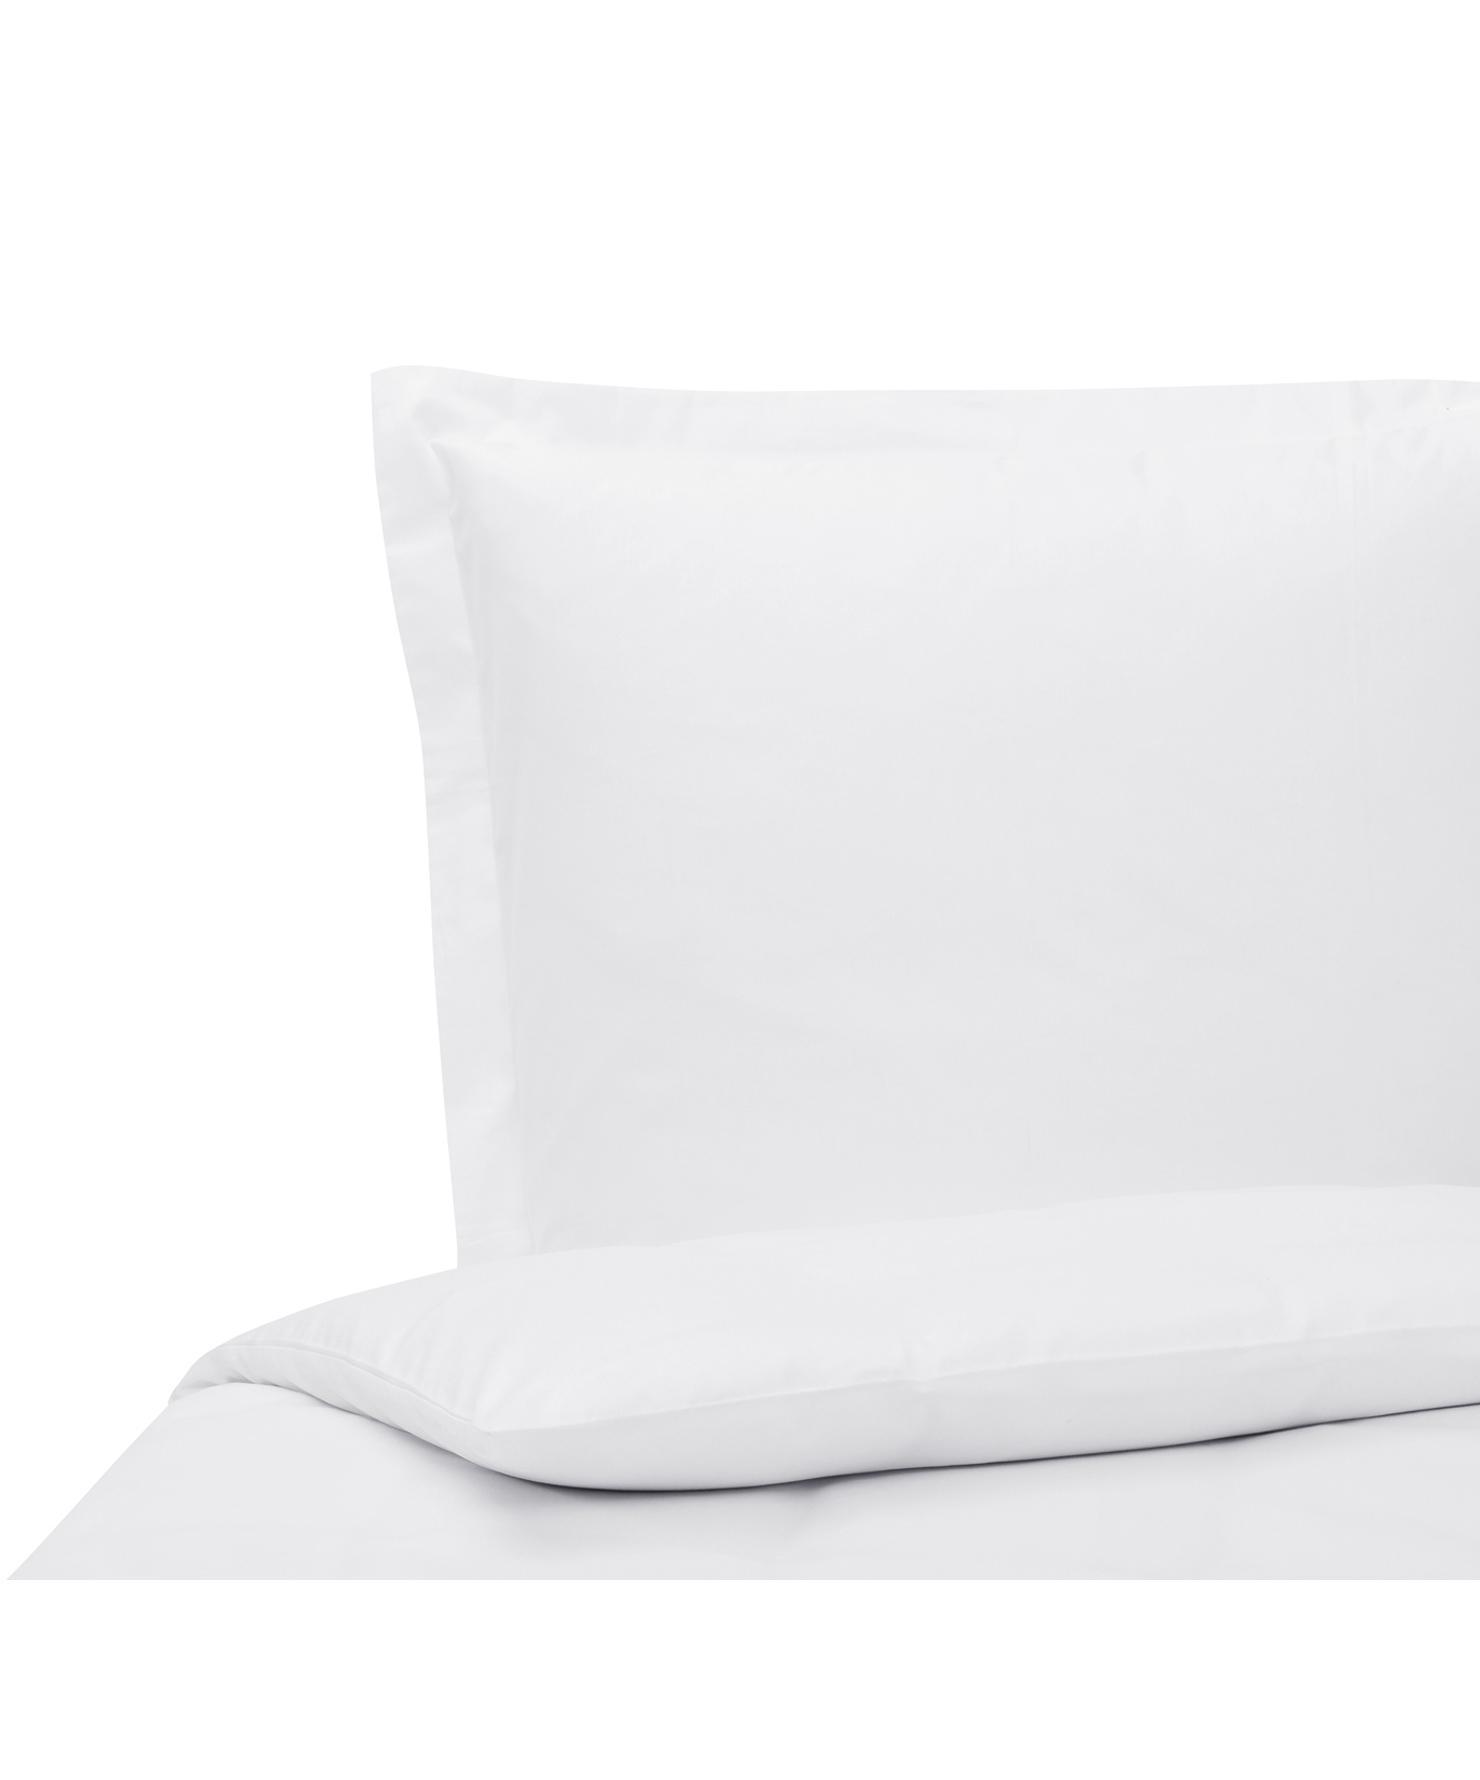 Funda nórdica de satén Premium, Blanco, Cama 90 cm (150 x 200 cm)